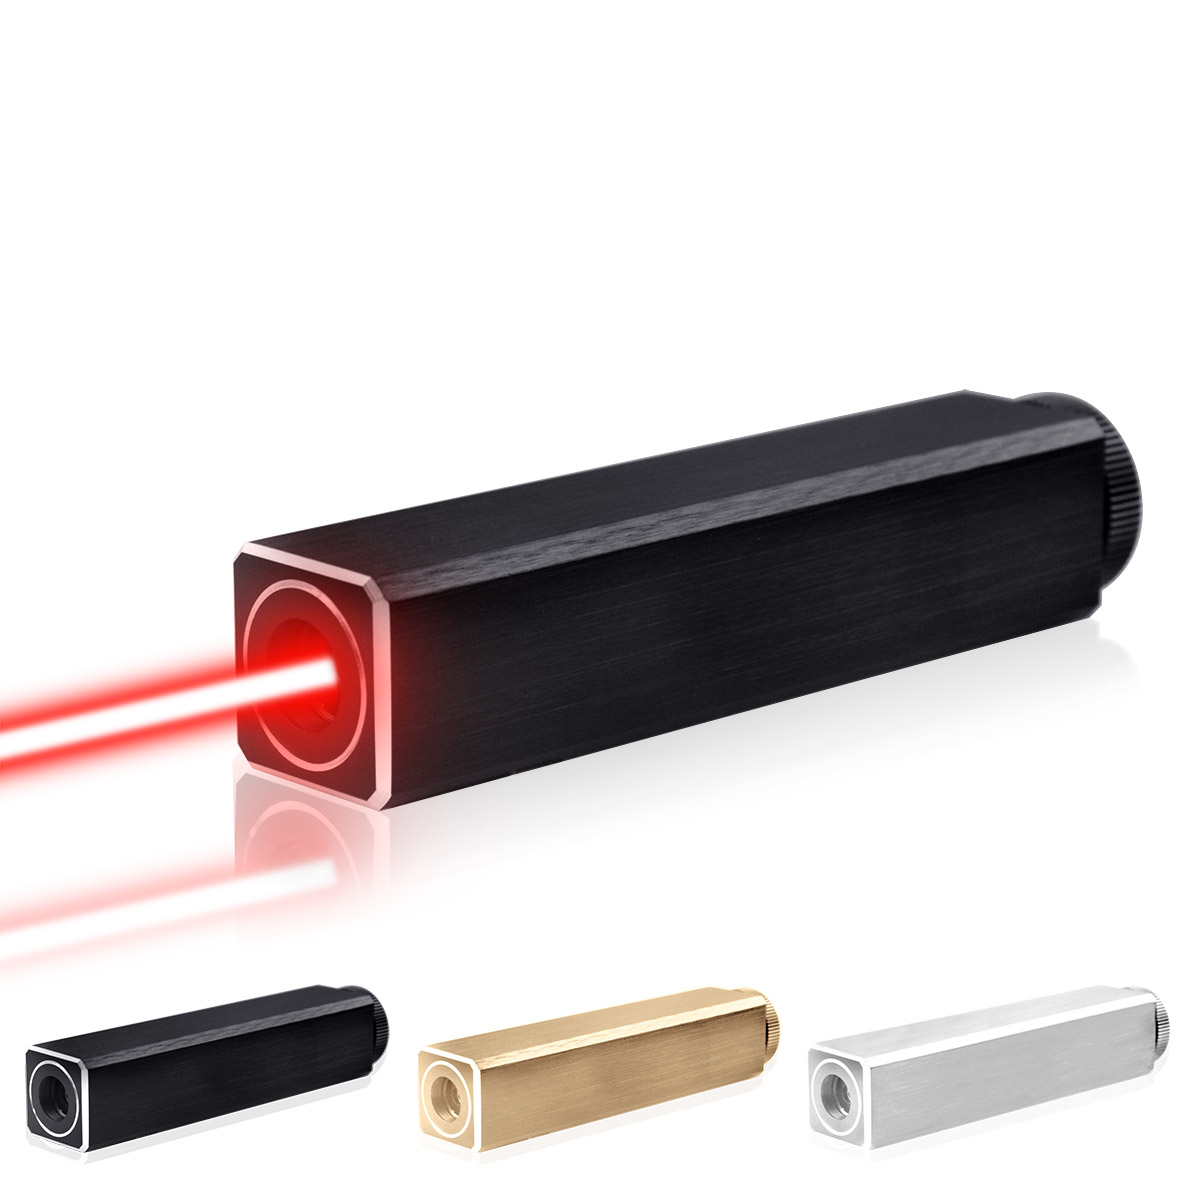 CWLASER 532nm vert/450nm bleu/405nm violet/650nm rouge pointeur Laser de forme carrée (3 couleurs) - 3